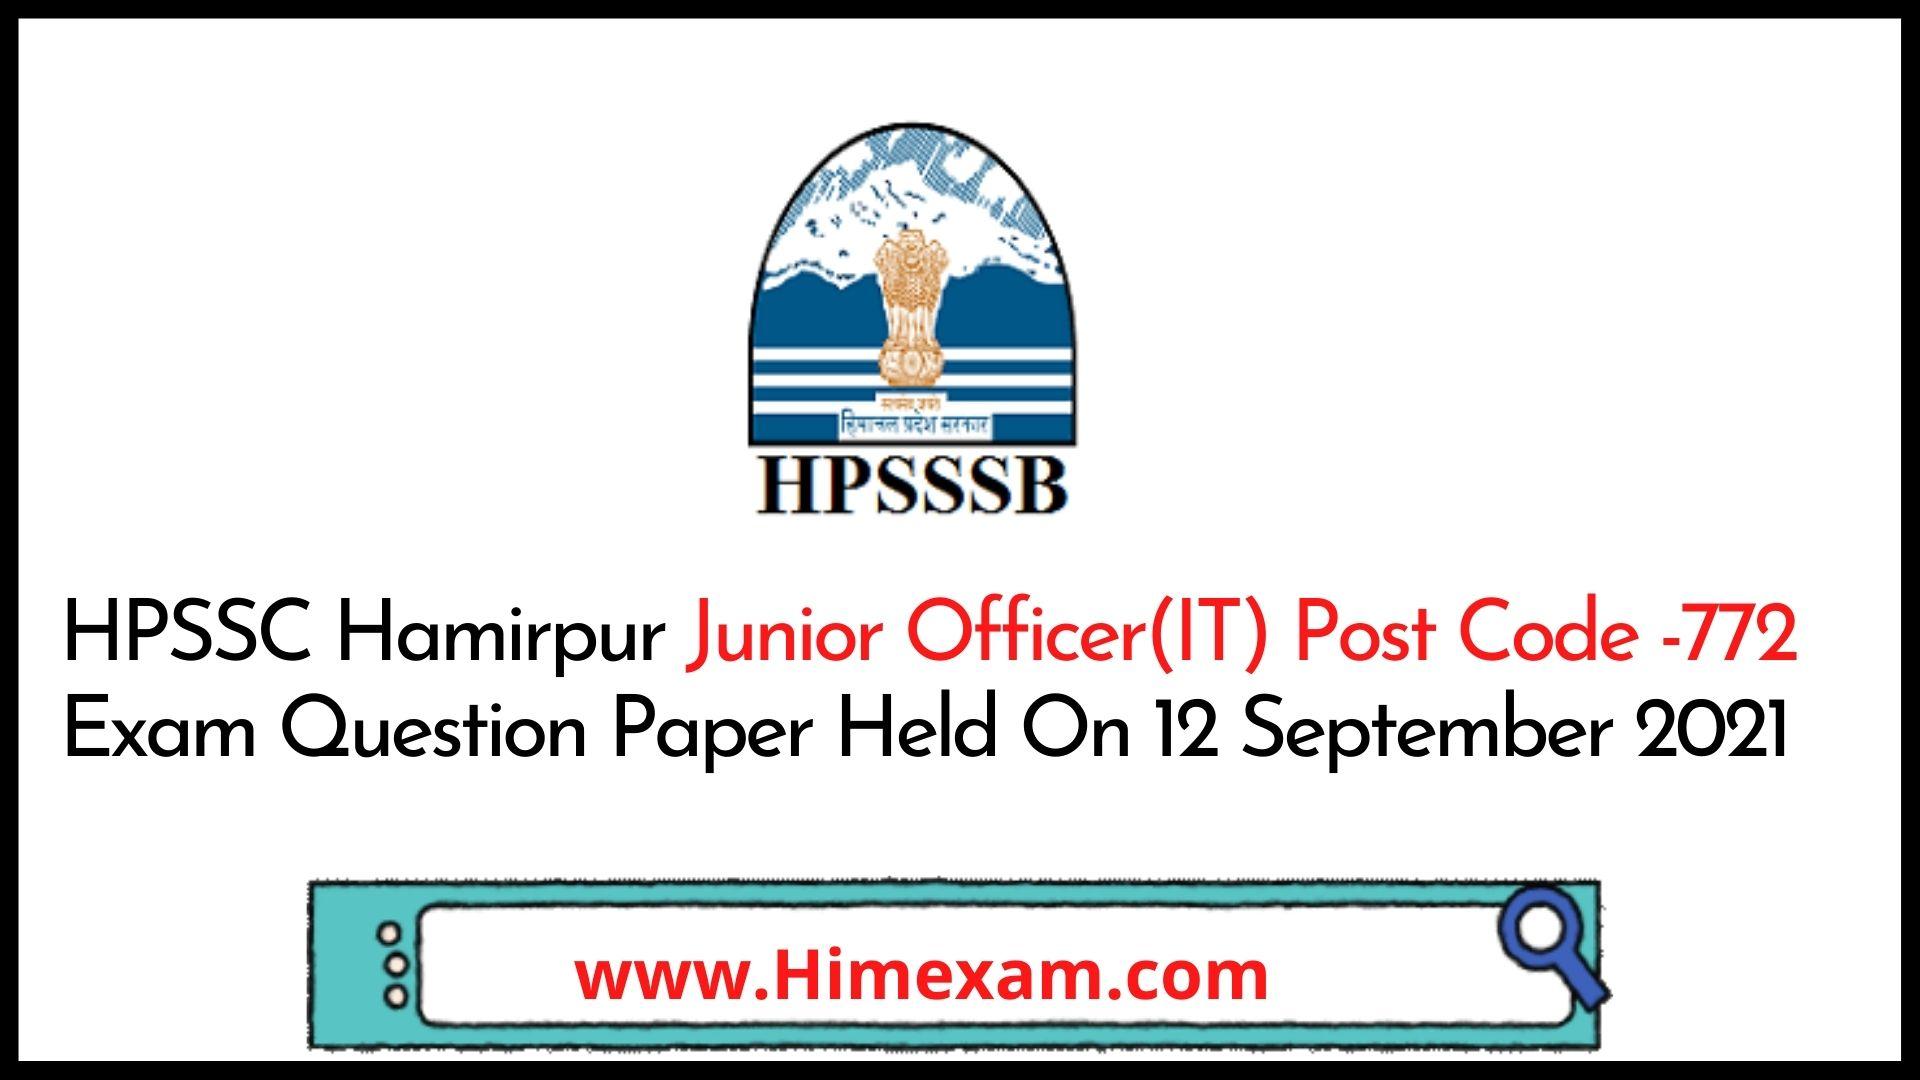 HPSSC Hamirpur Junior Officer(IT) Post Code -772 Exam Question Paper Held On 12 September 2021